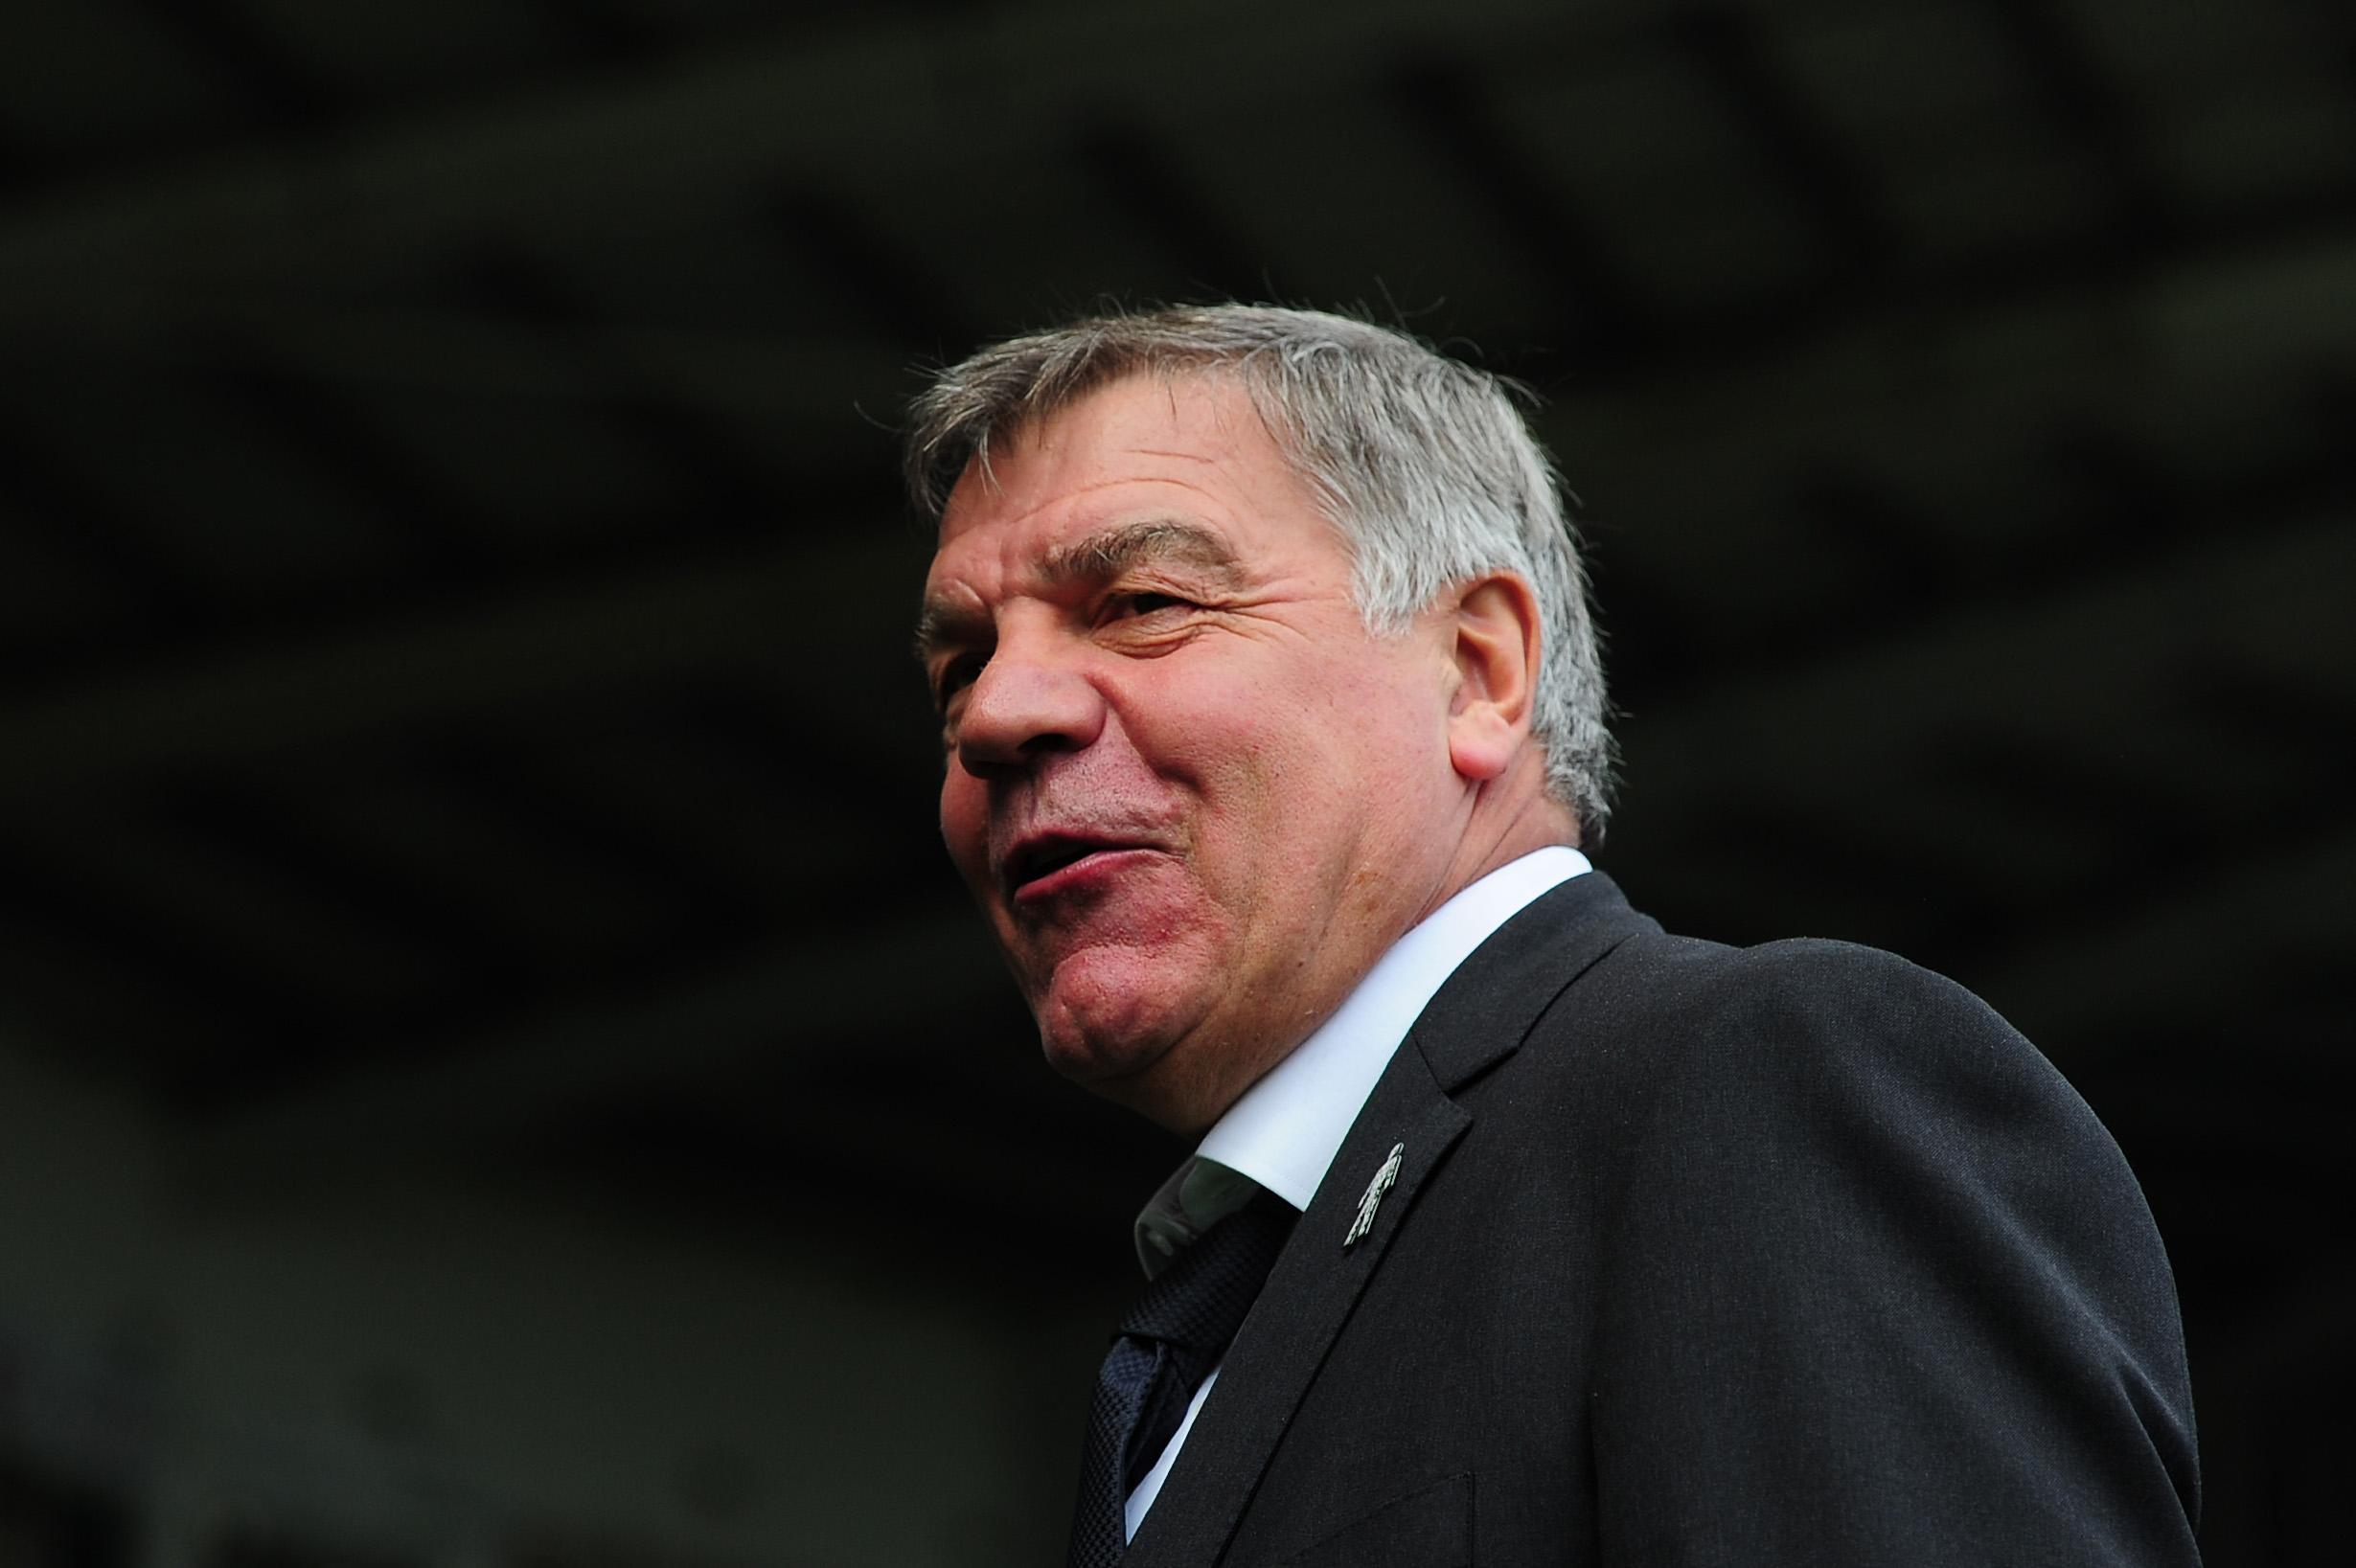 Everton razočarao navijače: Alardajs i dosadni fudbal ostaju i naredne sezone